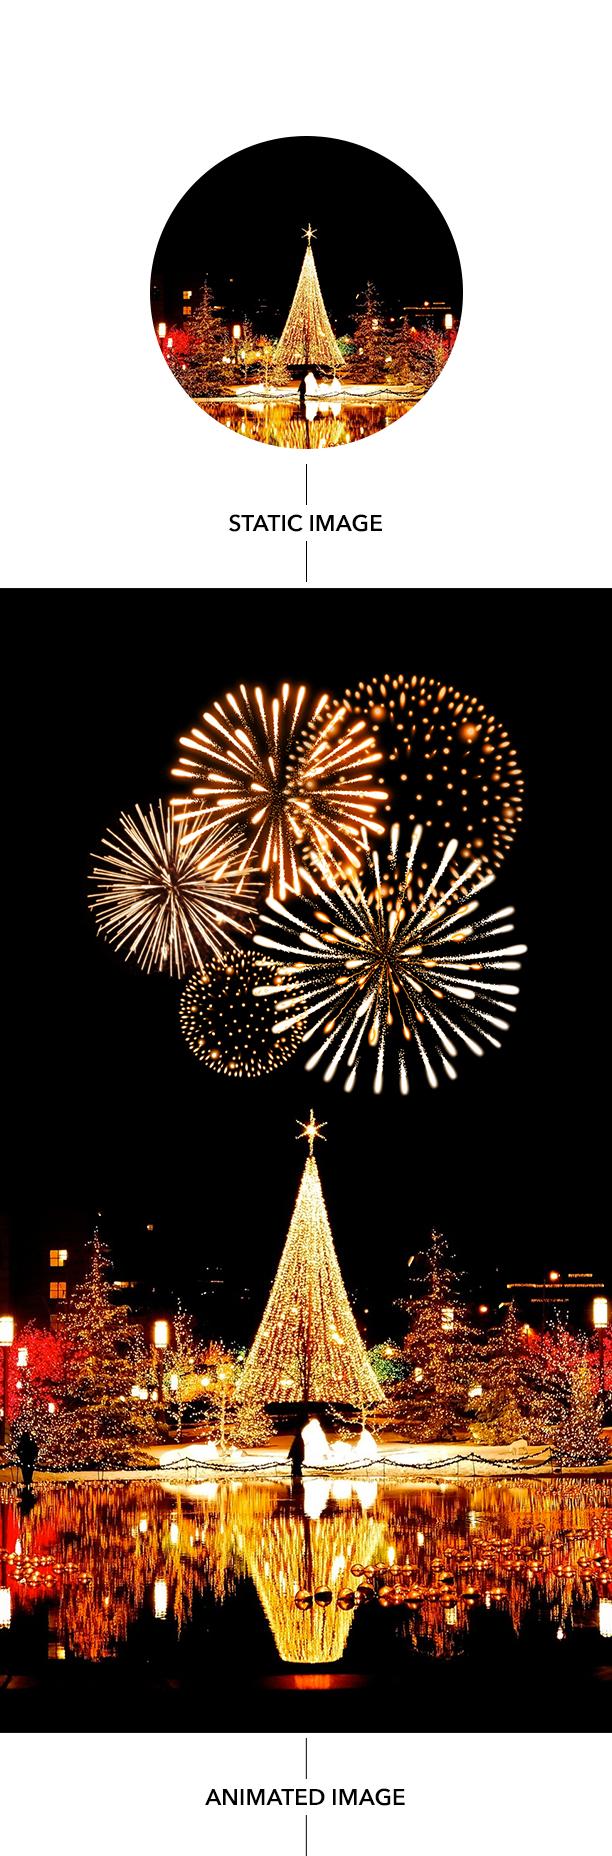 Gif Animated Fireworks Photoshop Action - 10